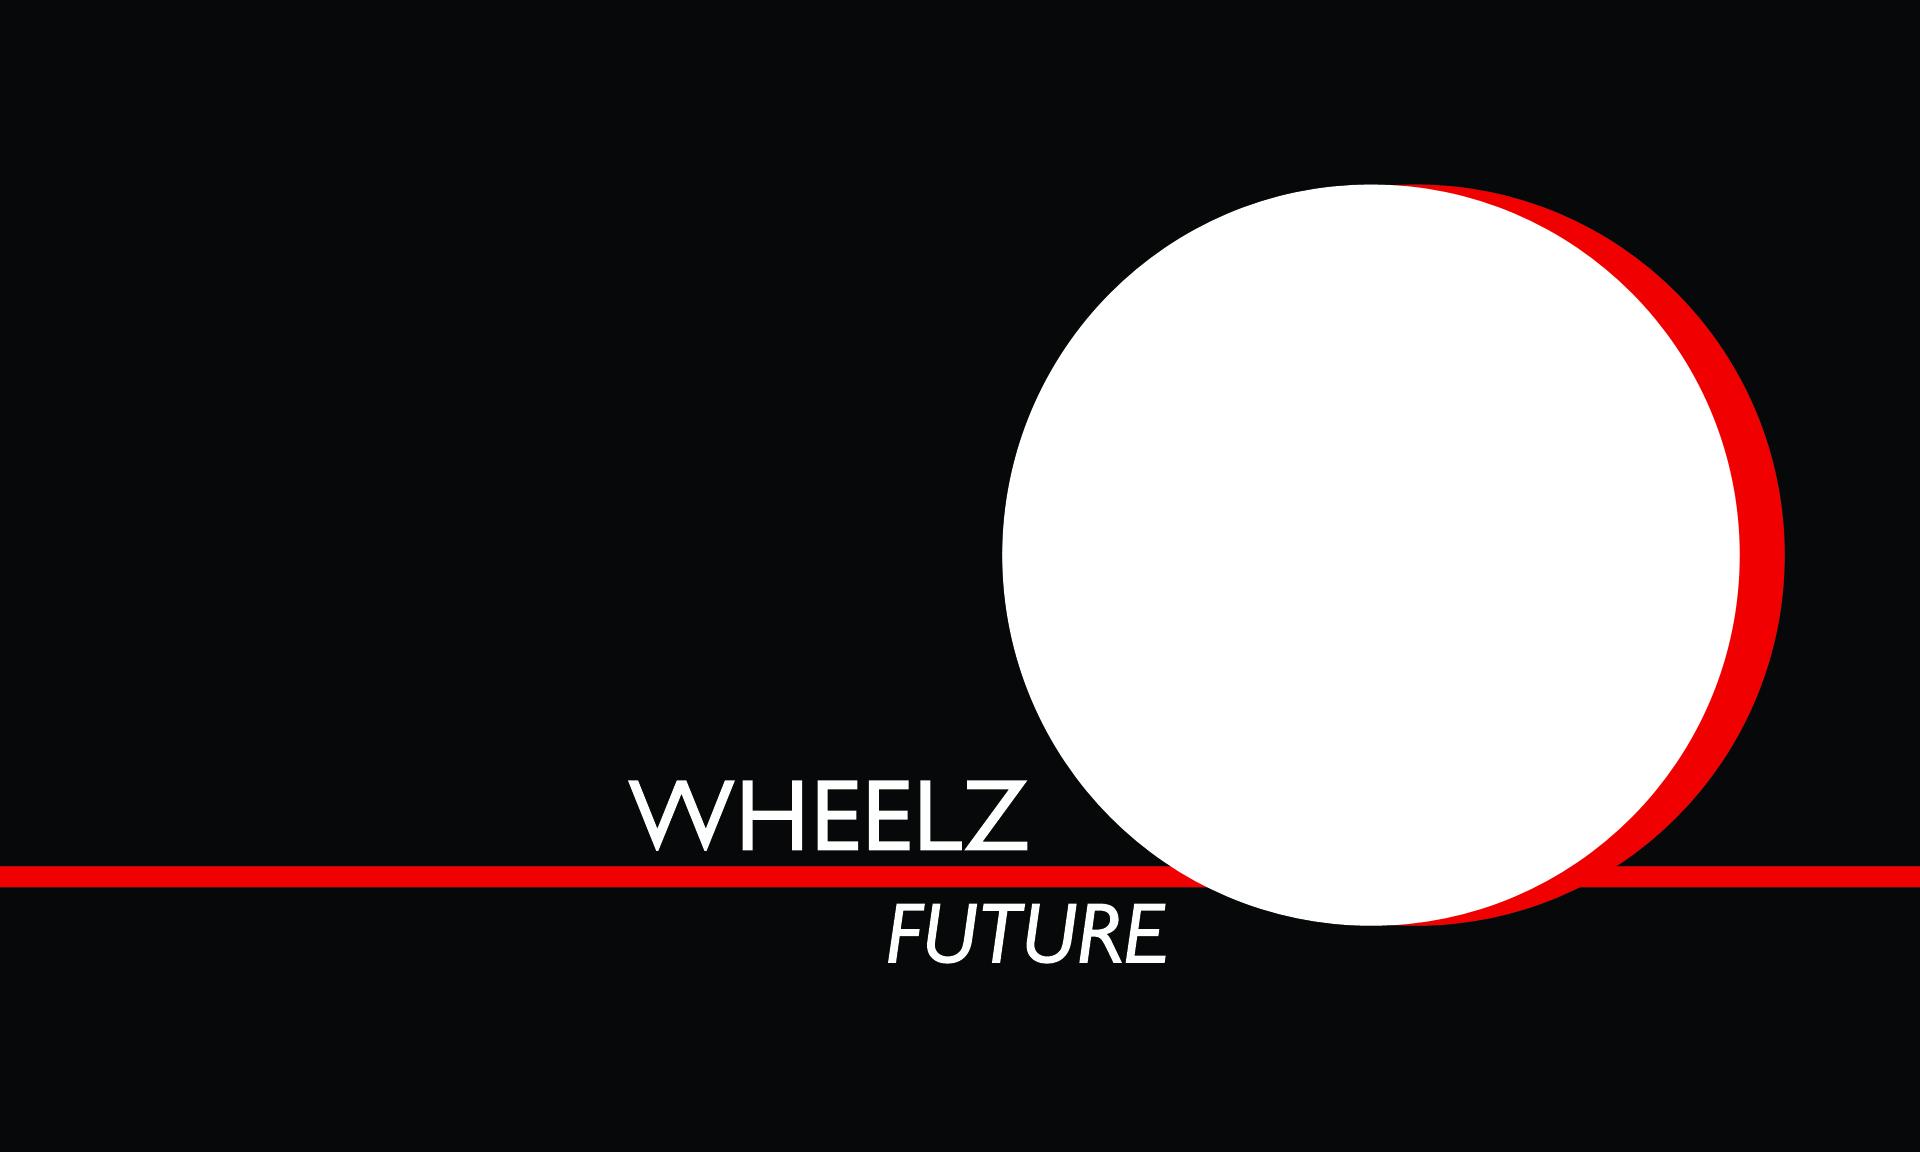 Wheelz Future